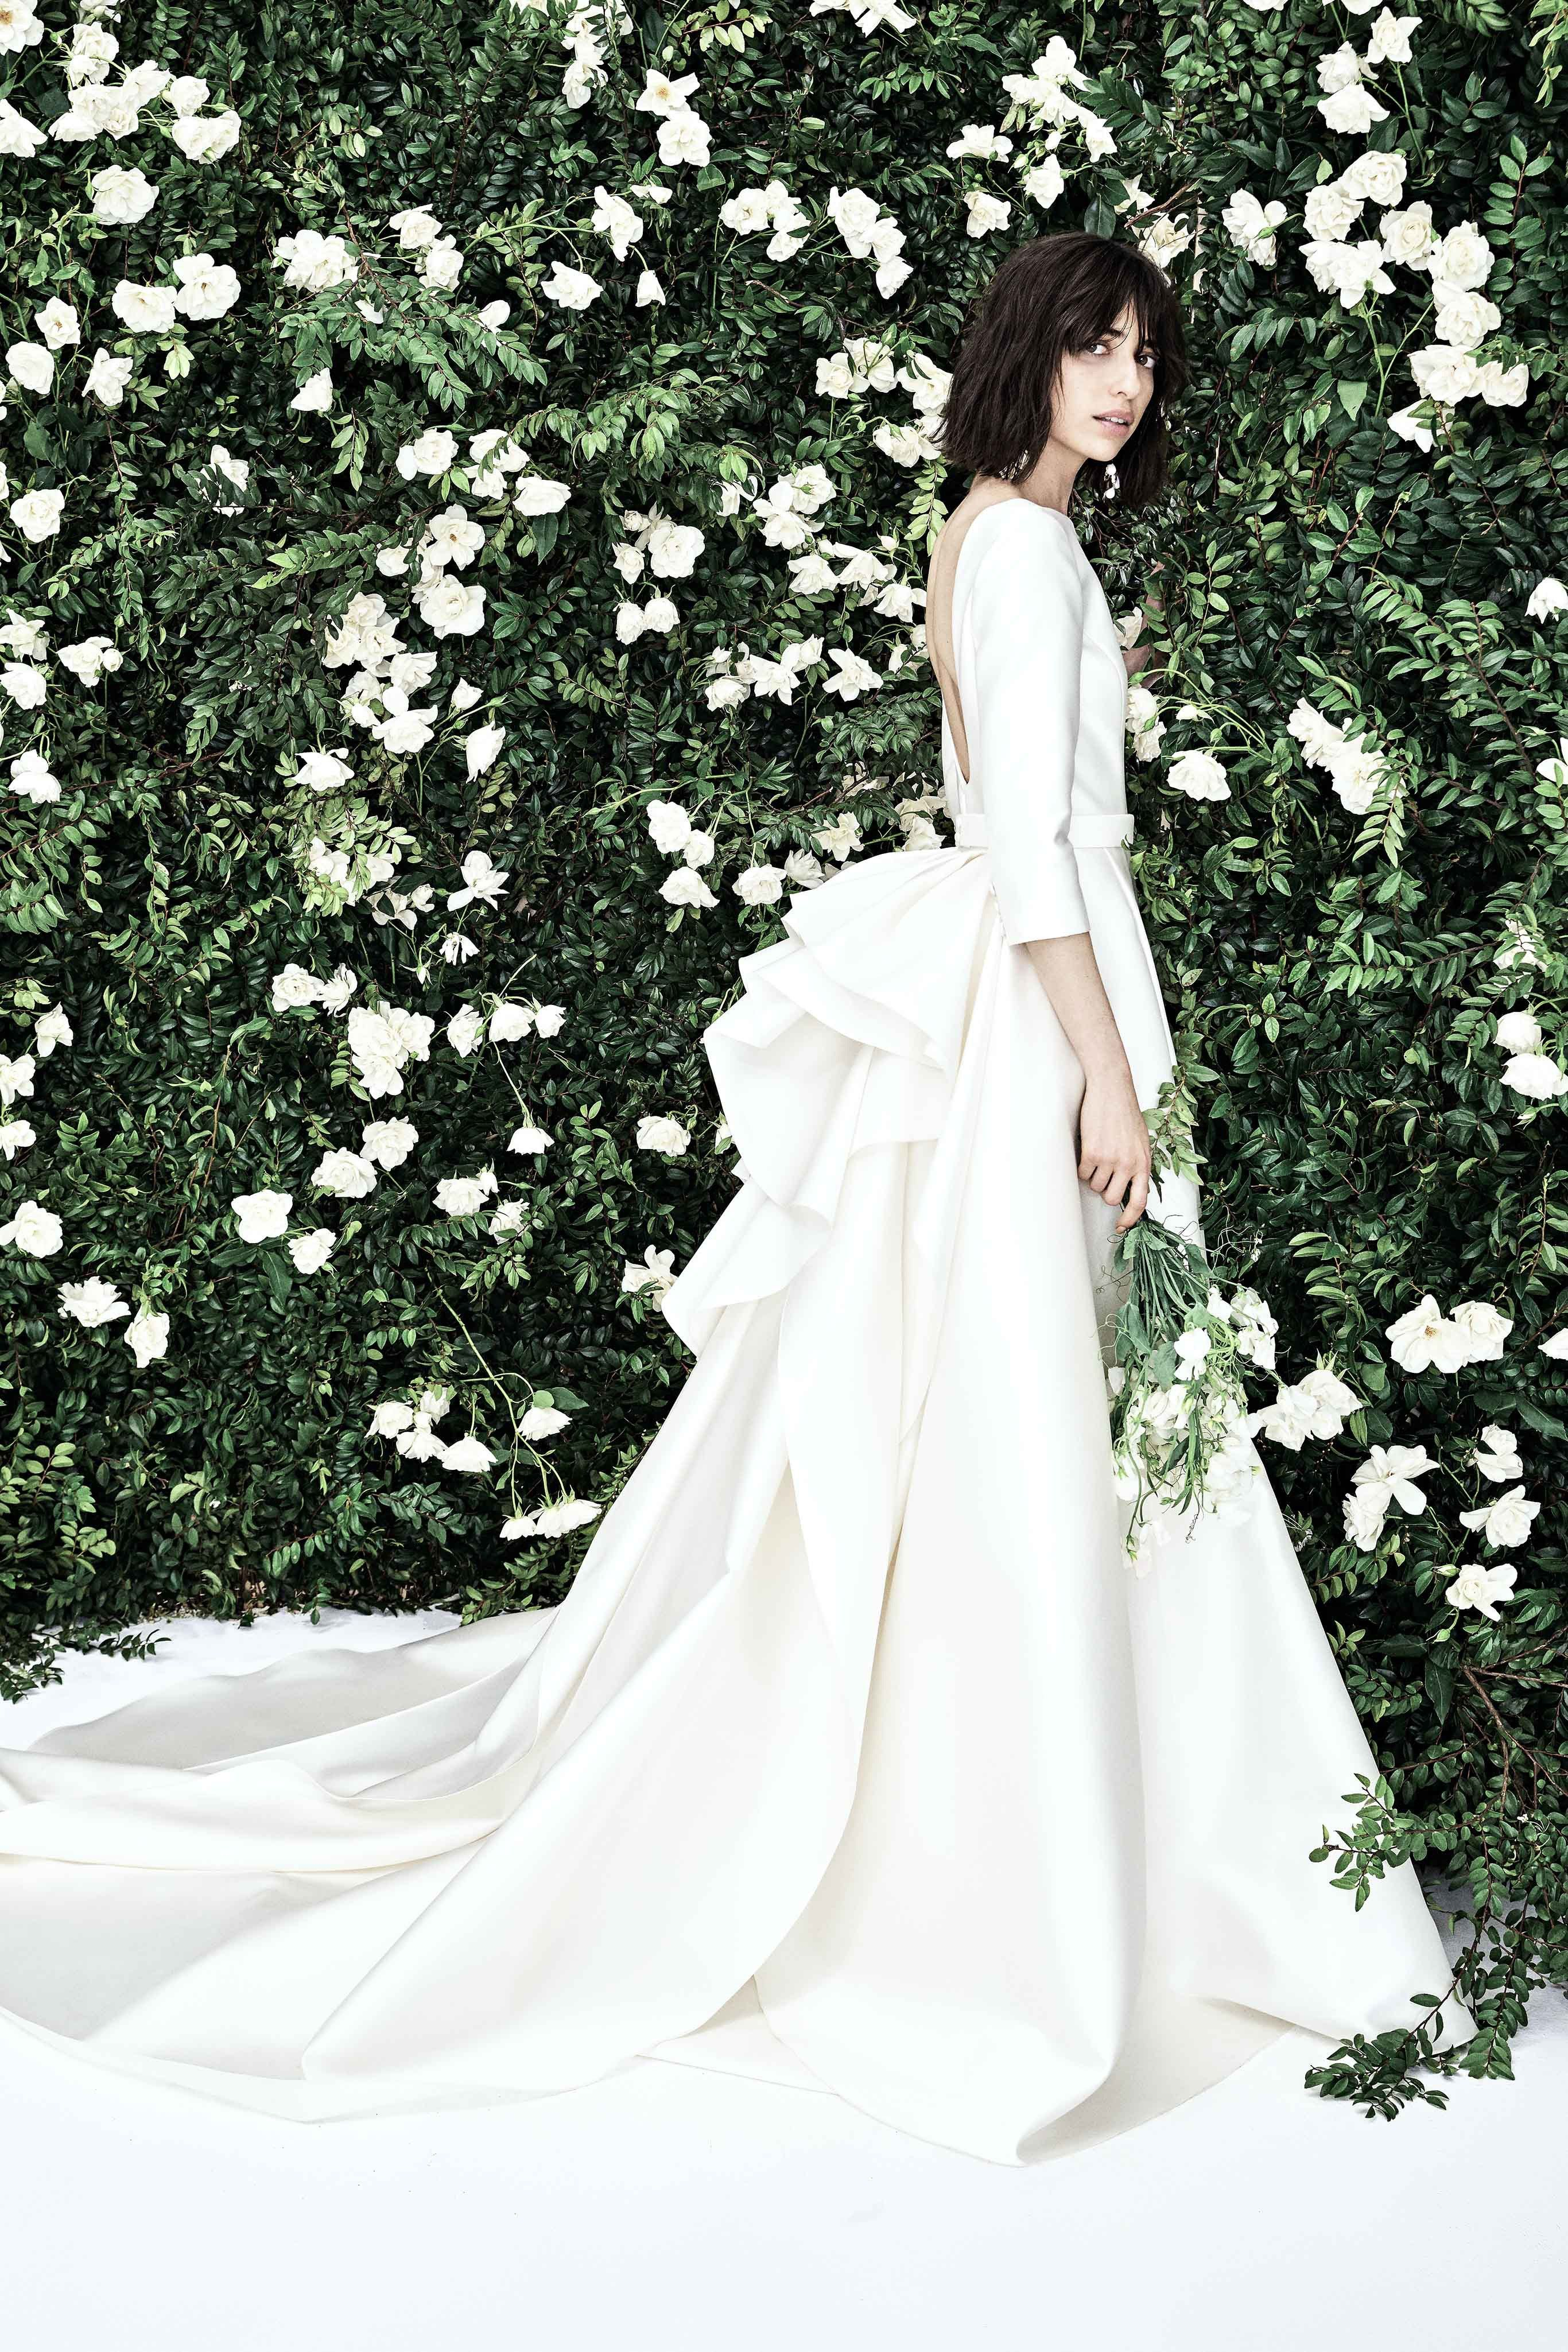 Carolina Herrera Bridal Spring 2020 Fashion Show Carolina Herrera Bridal Herrera Wedding Dress Wedding Dress Trends